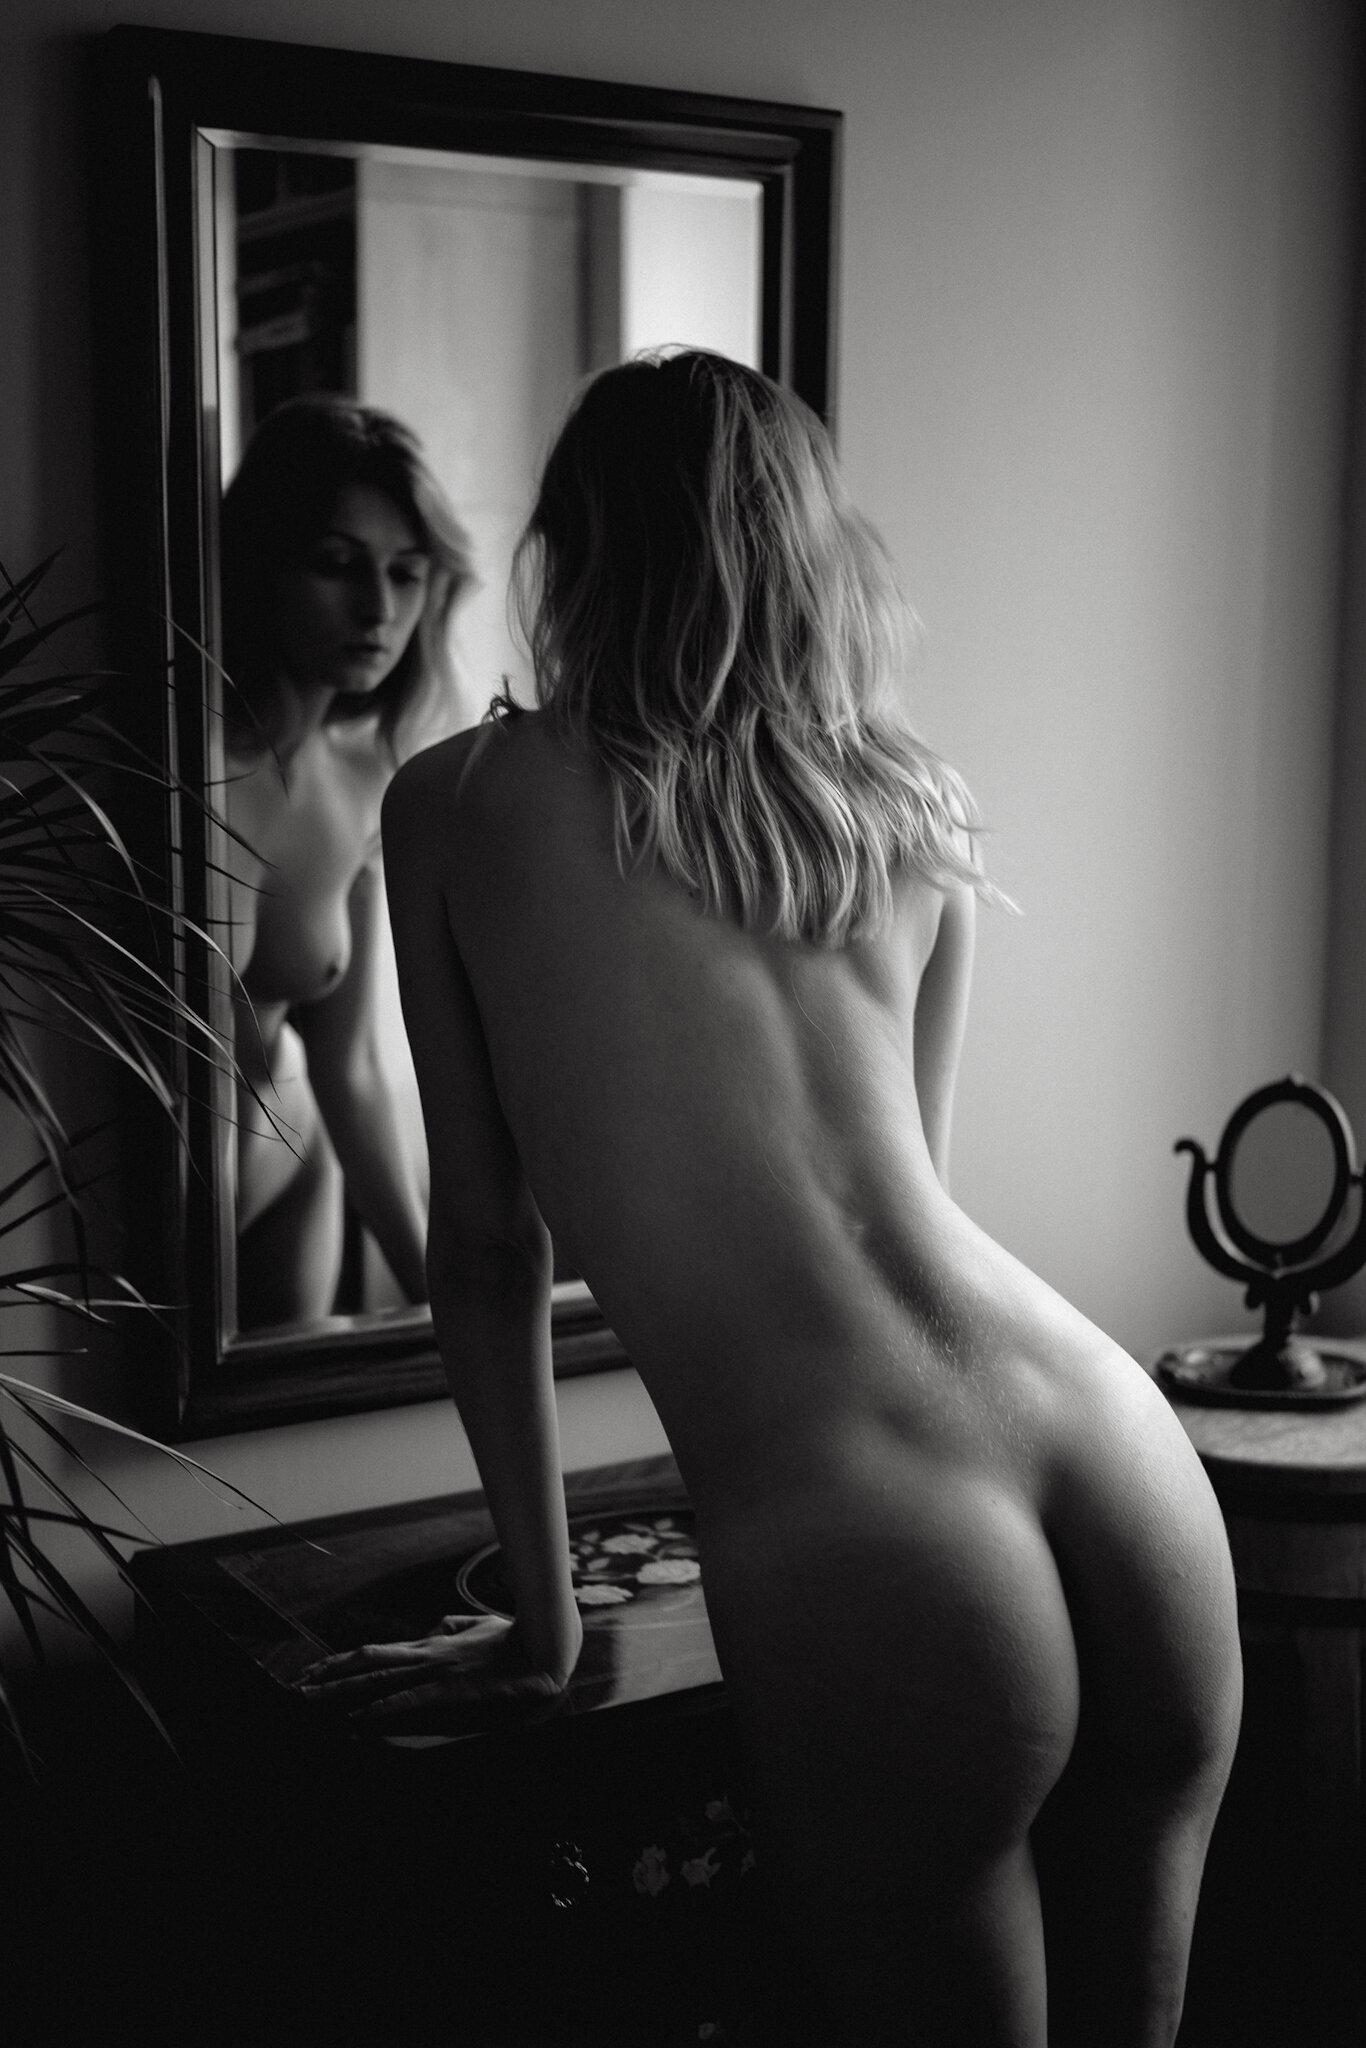 Monika Lipigorska - Marcin Krystyniak photoshoot